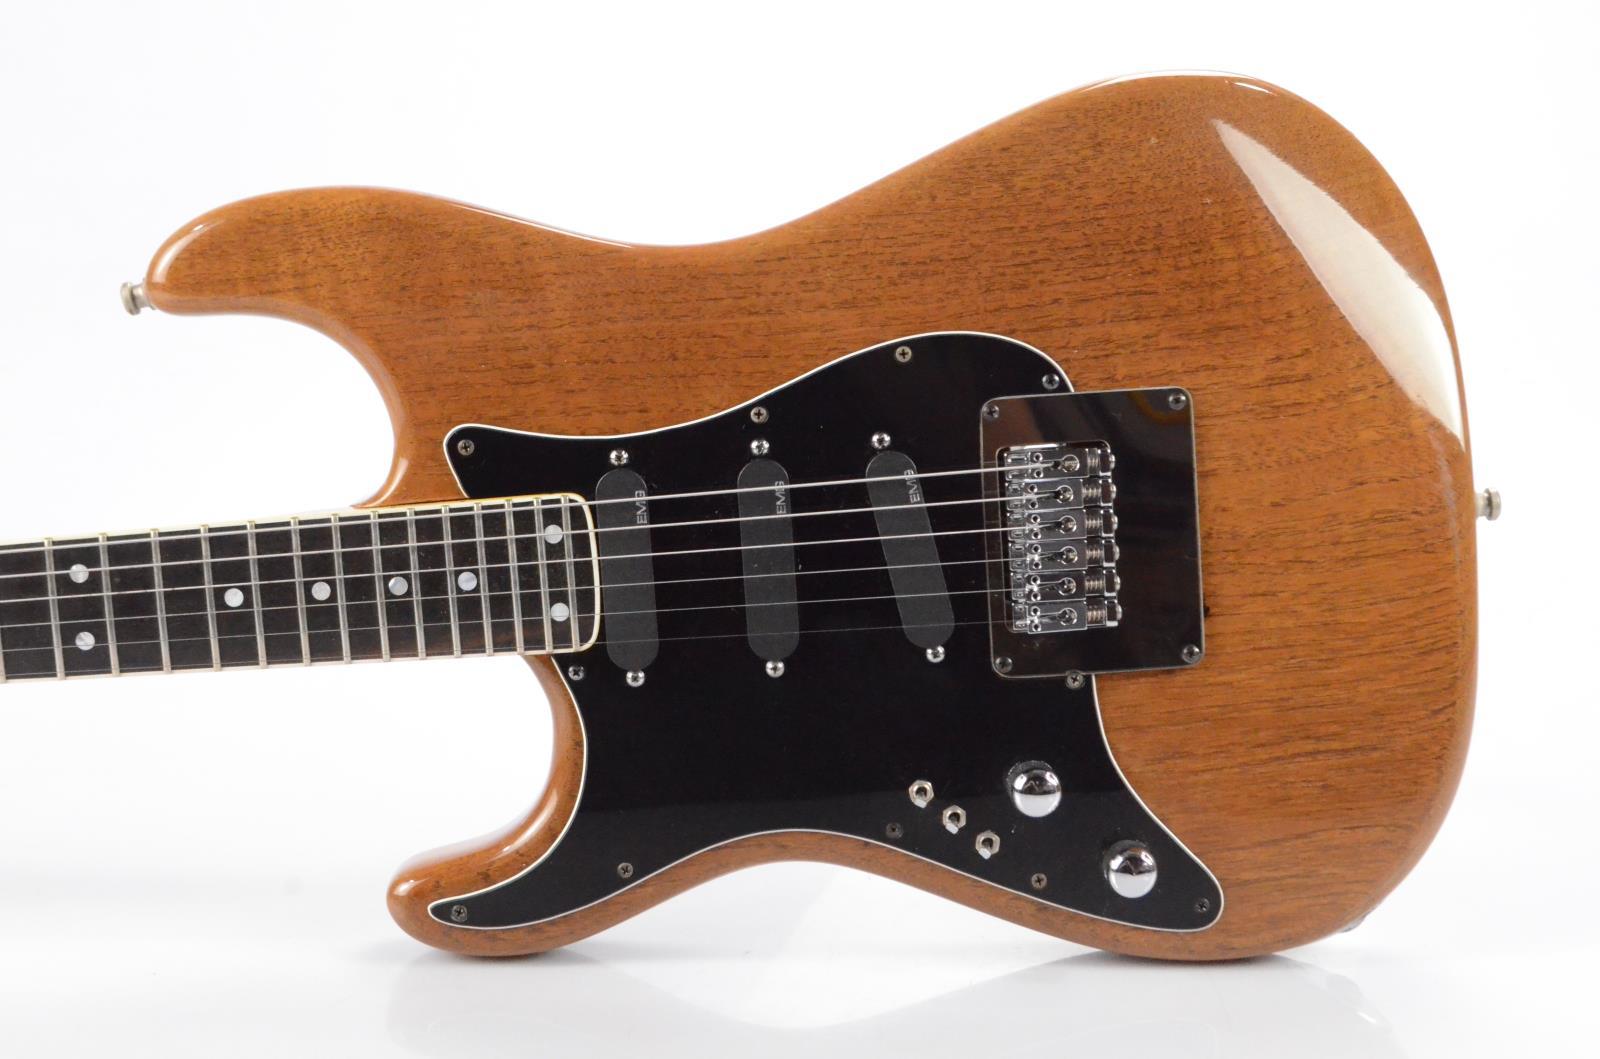 Valley Arts Stratocaster Strat w/ Fender Case Left Handed Carlos Rios #33985